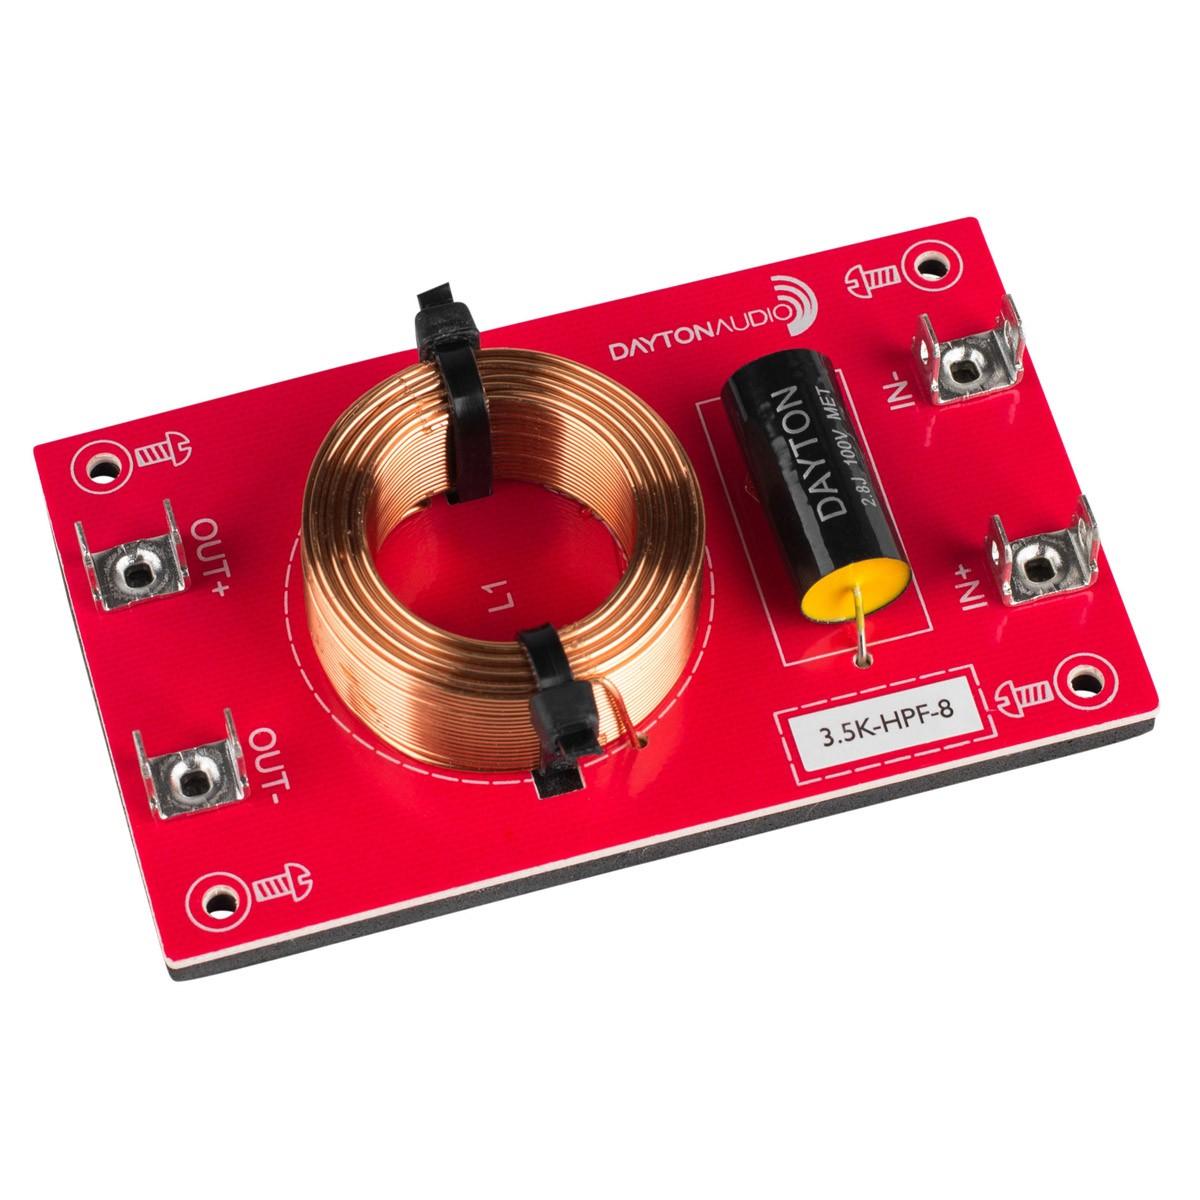 DAYTON AUDIO 3.5K-HPF-8 Speaker High Pass Filter 3500Hz 12dB/Octave 8 Ohm